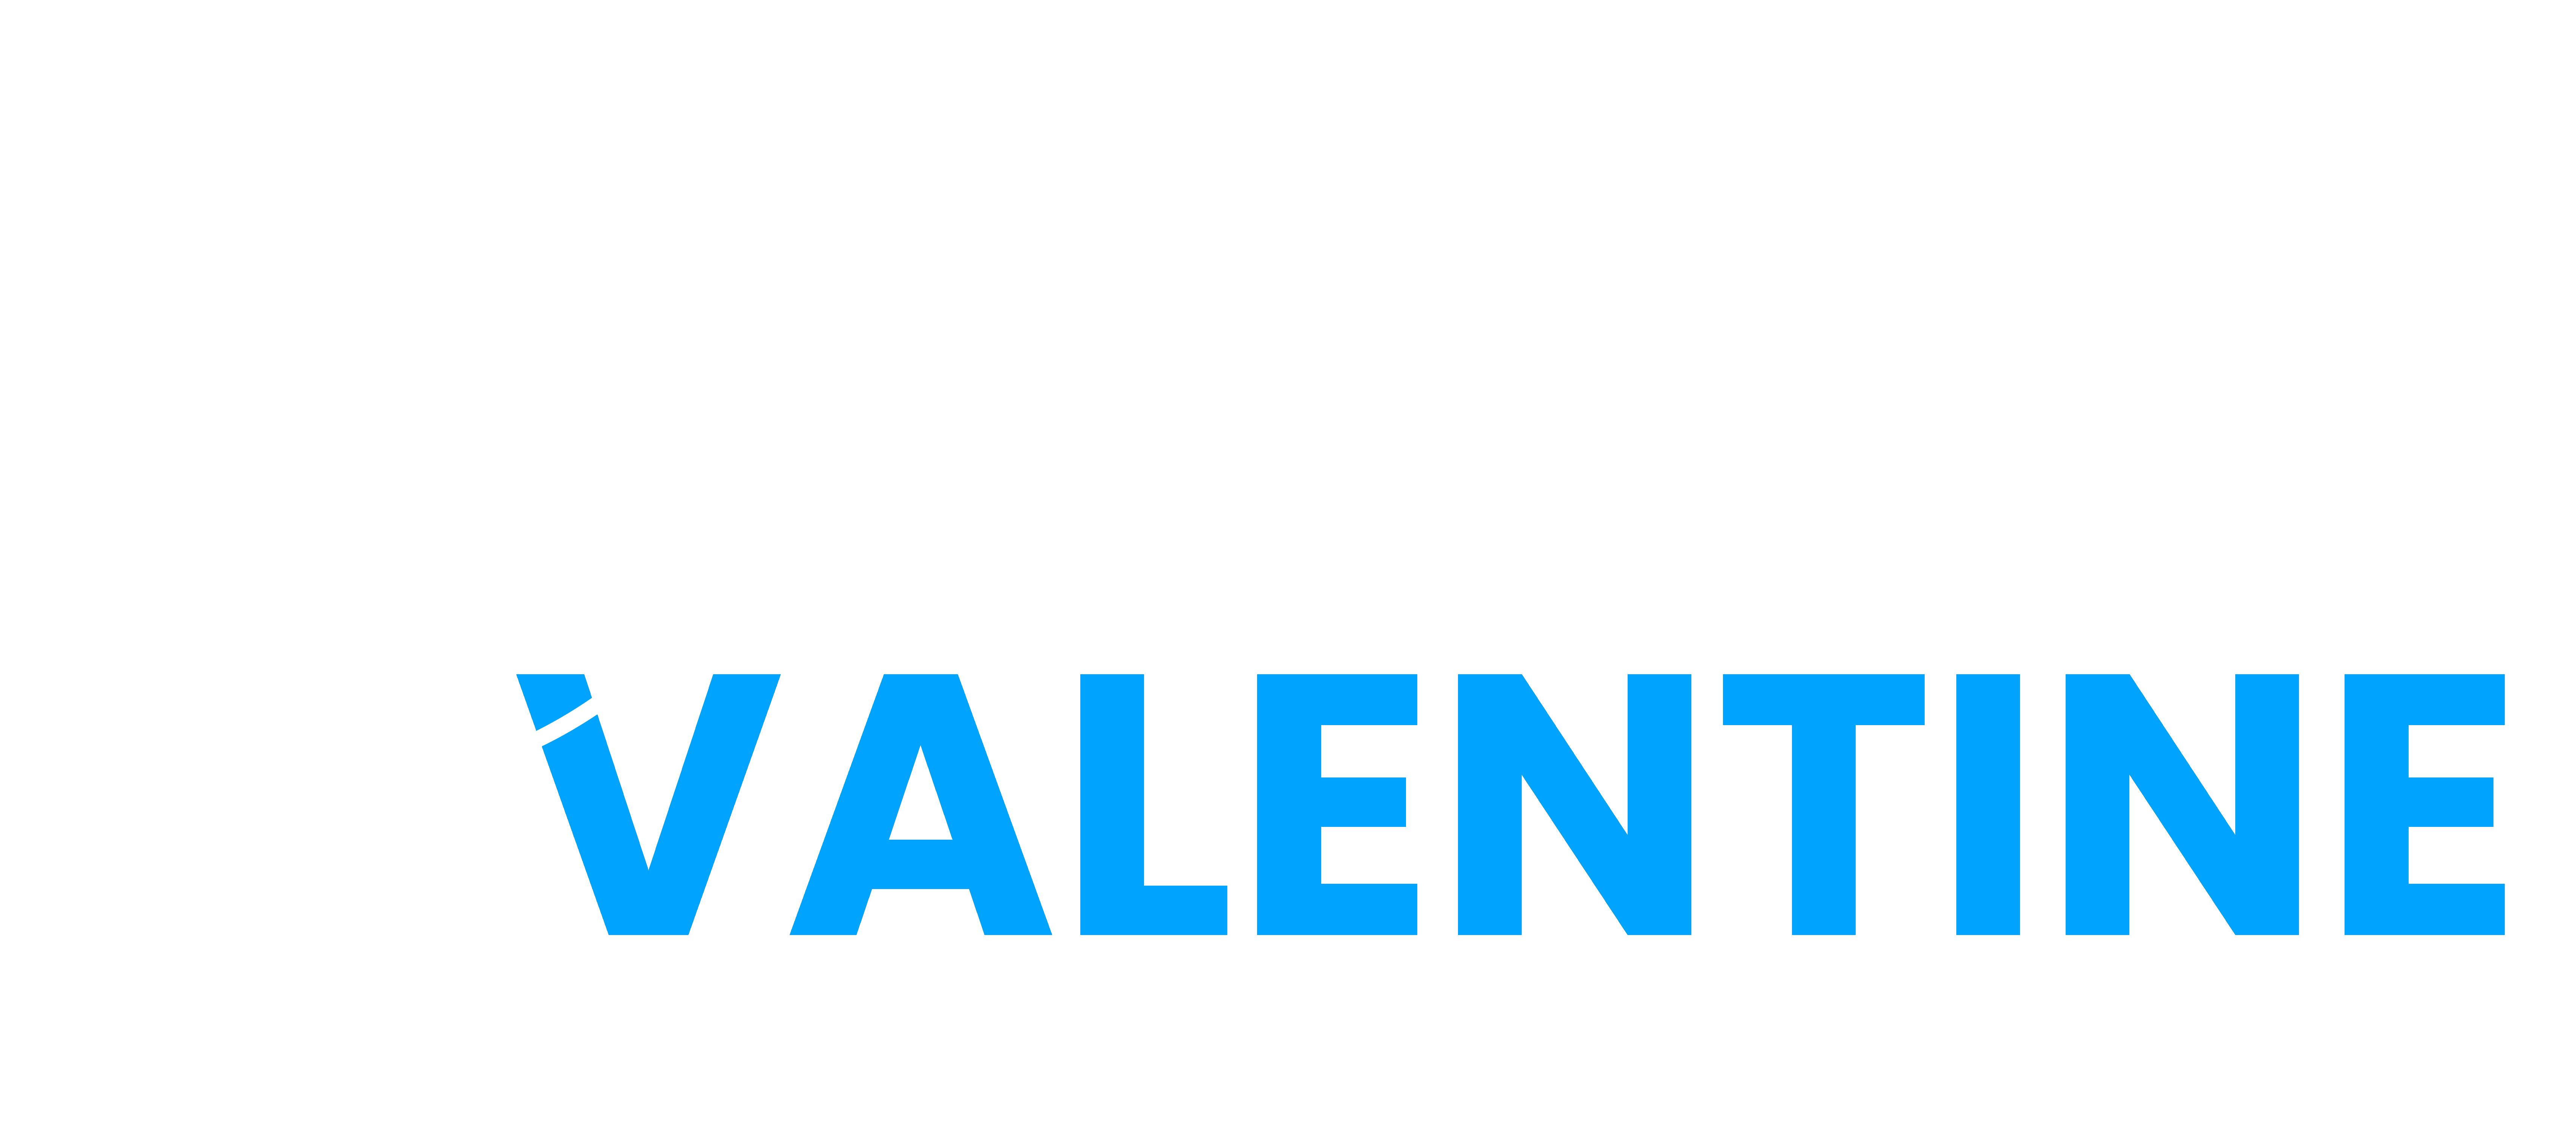 Dave Valentine